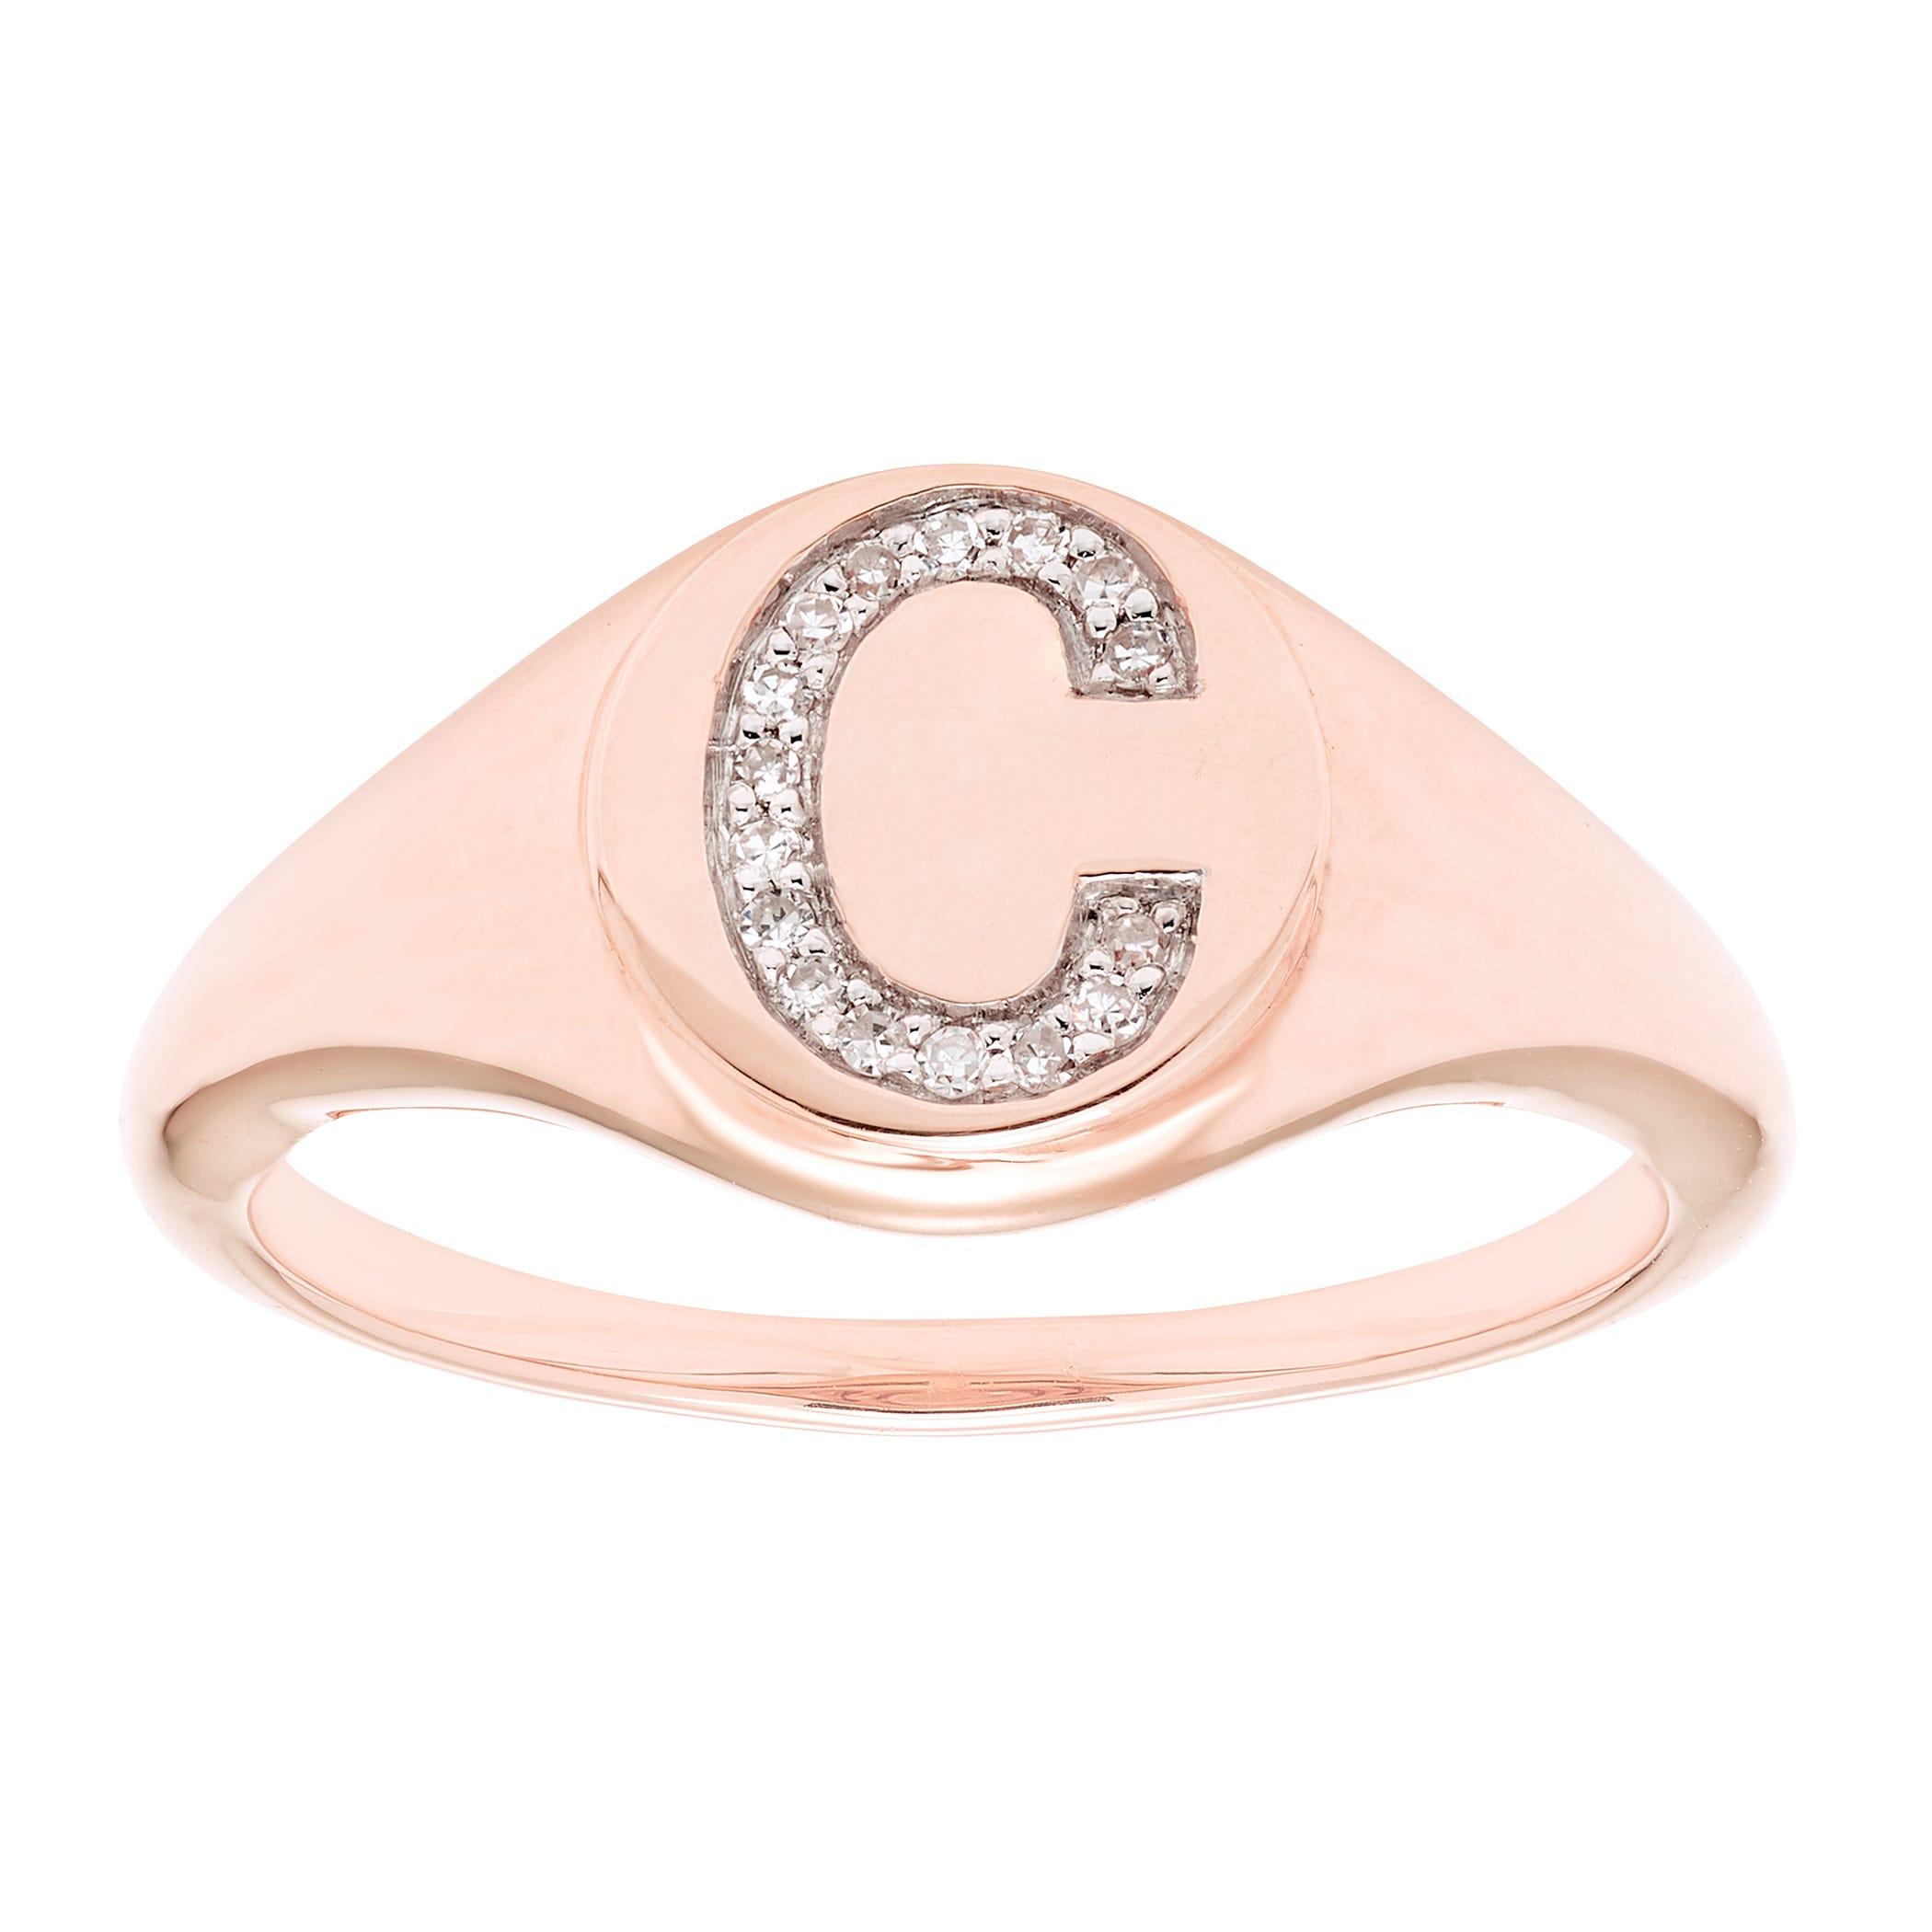 Diamond Initial C Signet Ring in 14k Rose Gold